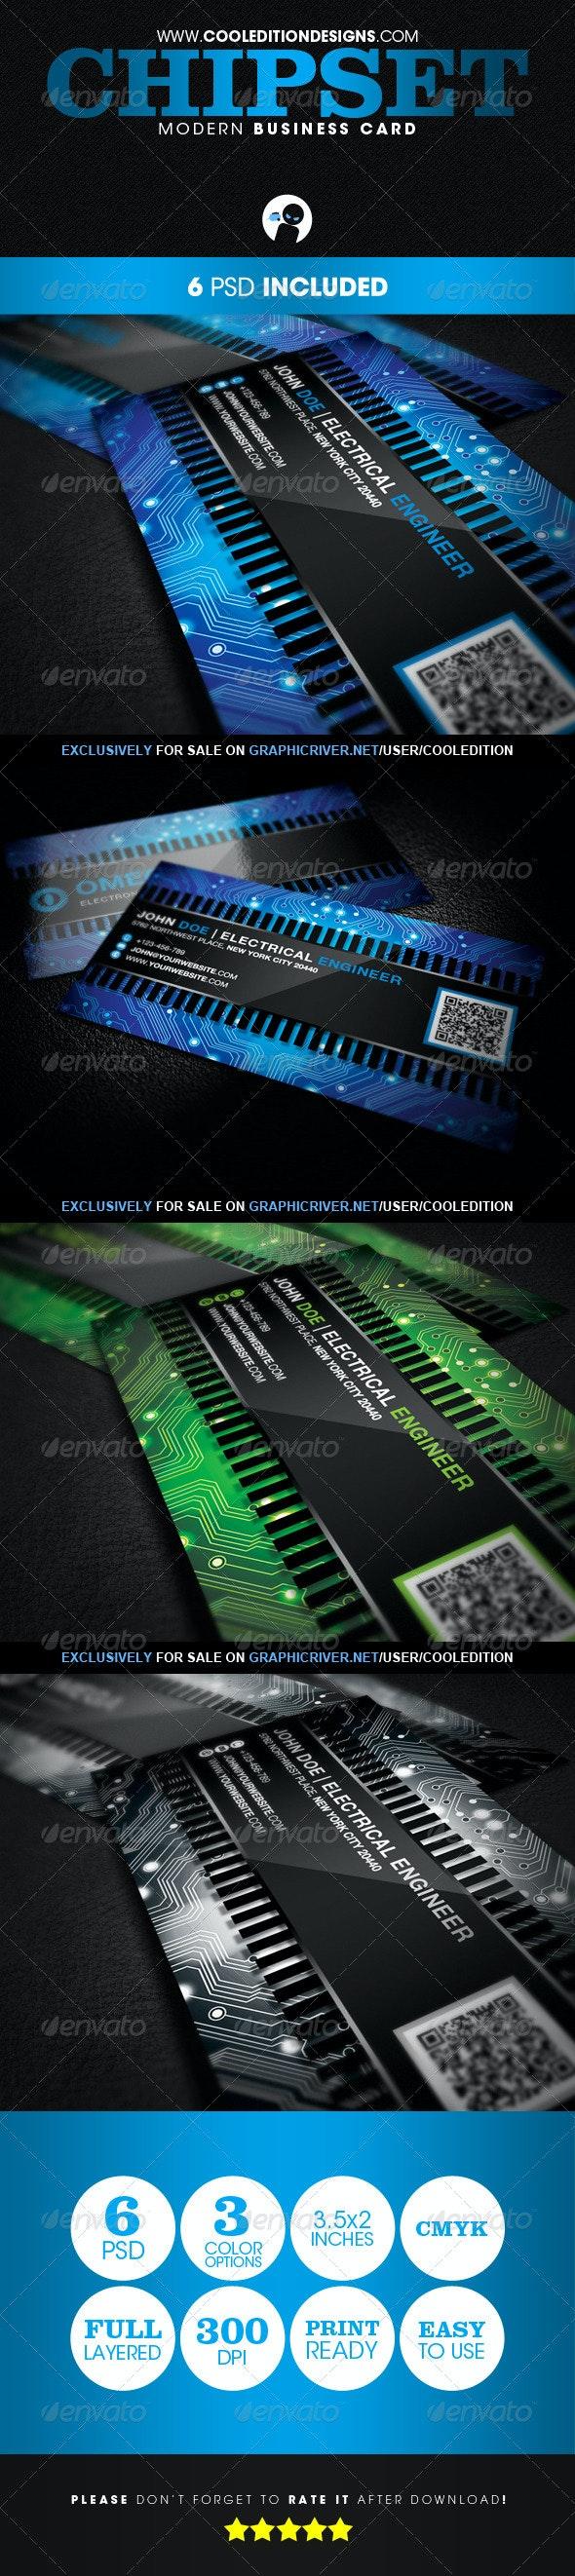 Chipset Modern - Business Card - Creative Business Cards